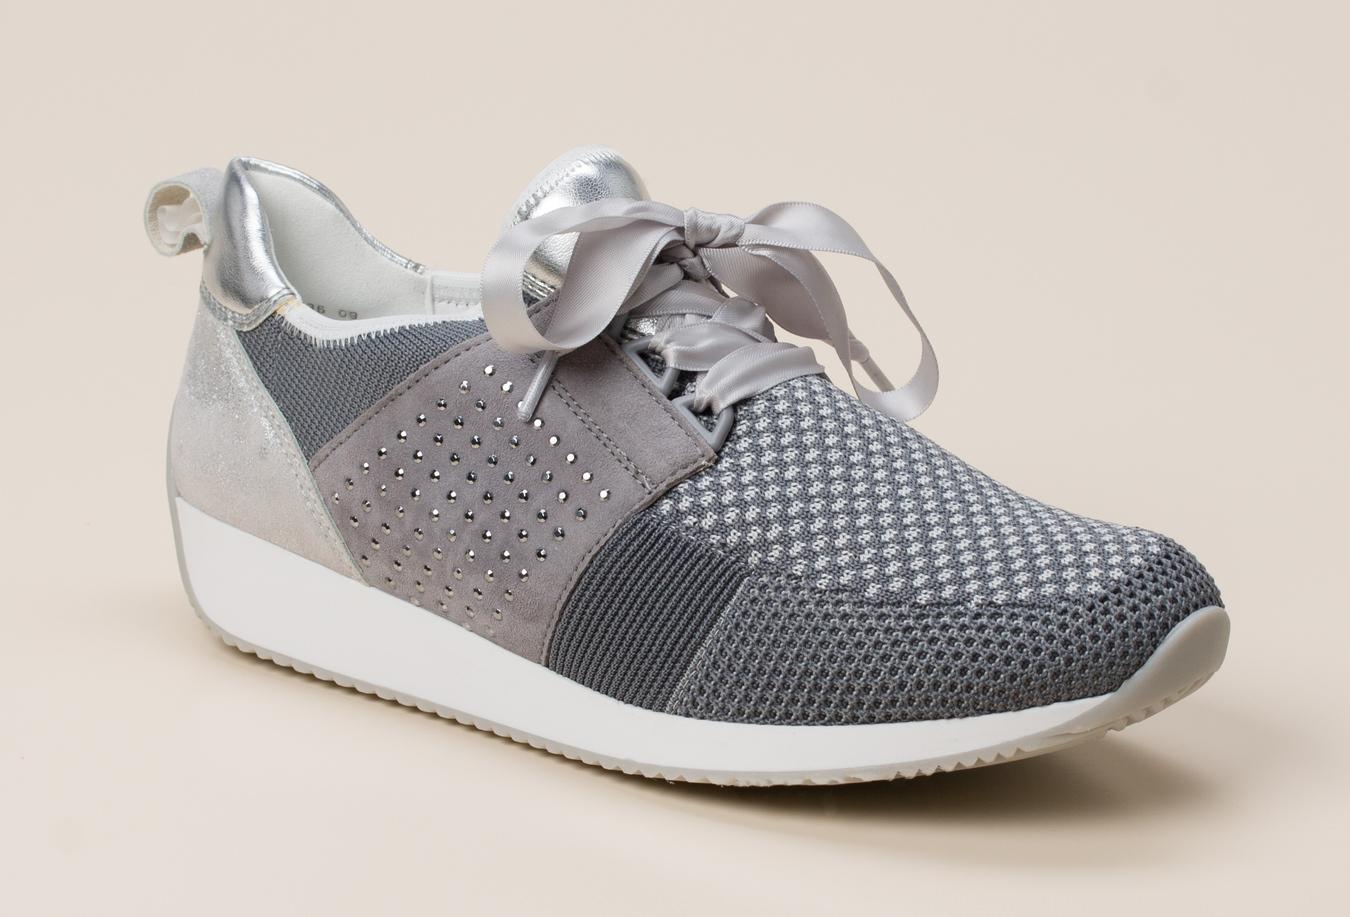 new concept 5b84d ff9ed Ara Damen Sneaker in silber kaufen | Zumnorde Online-Shop